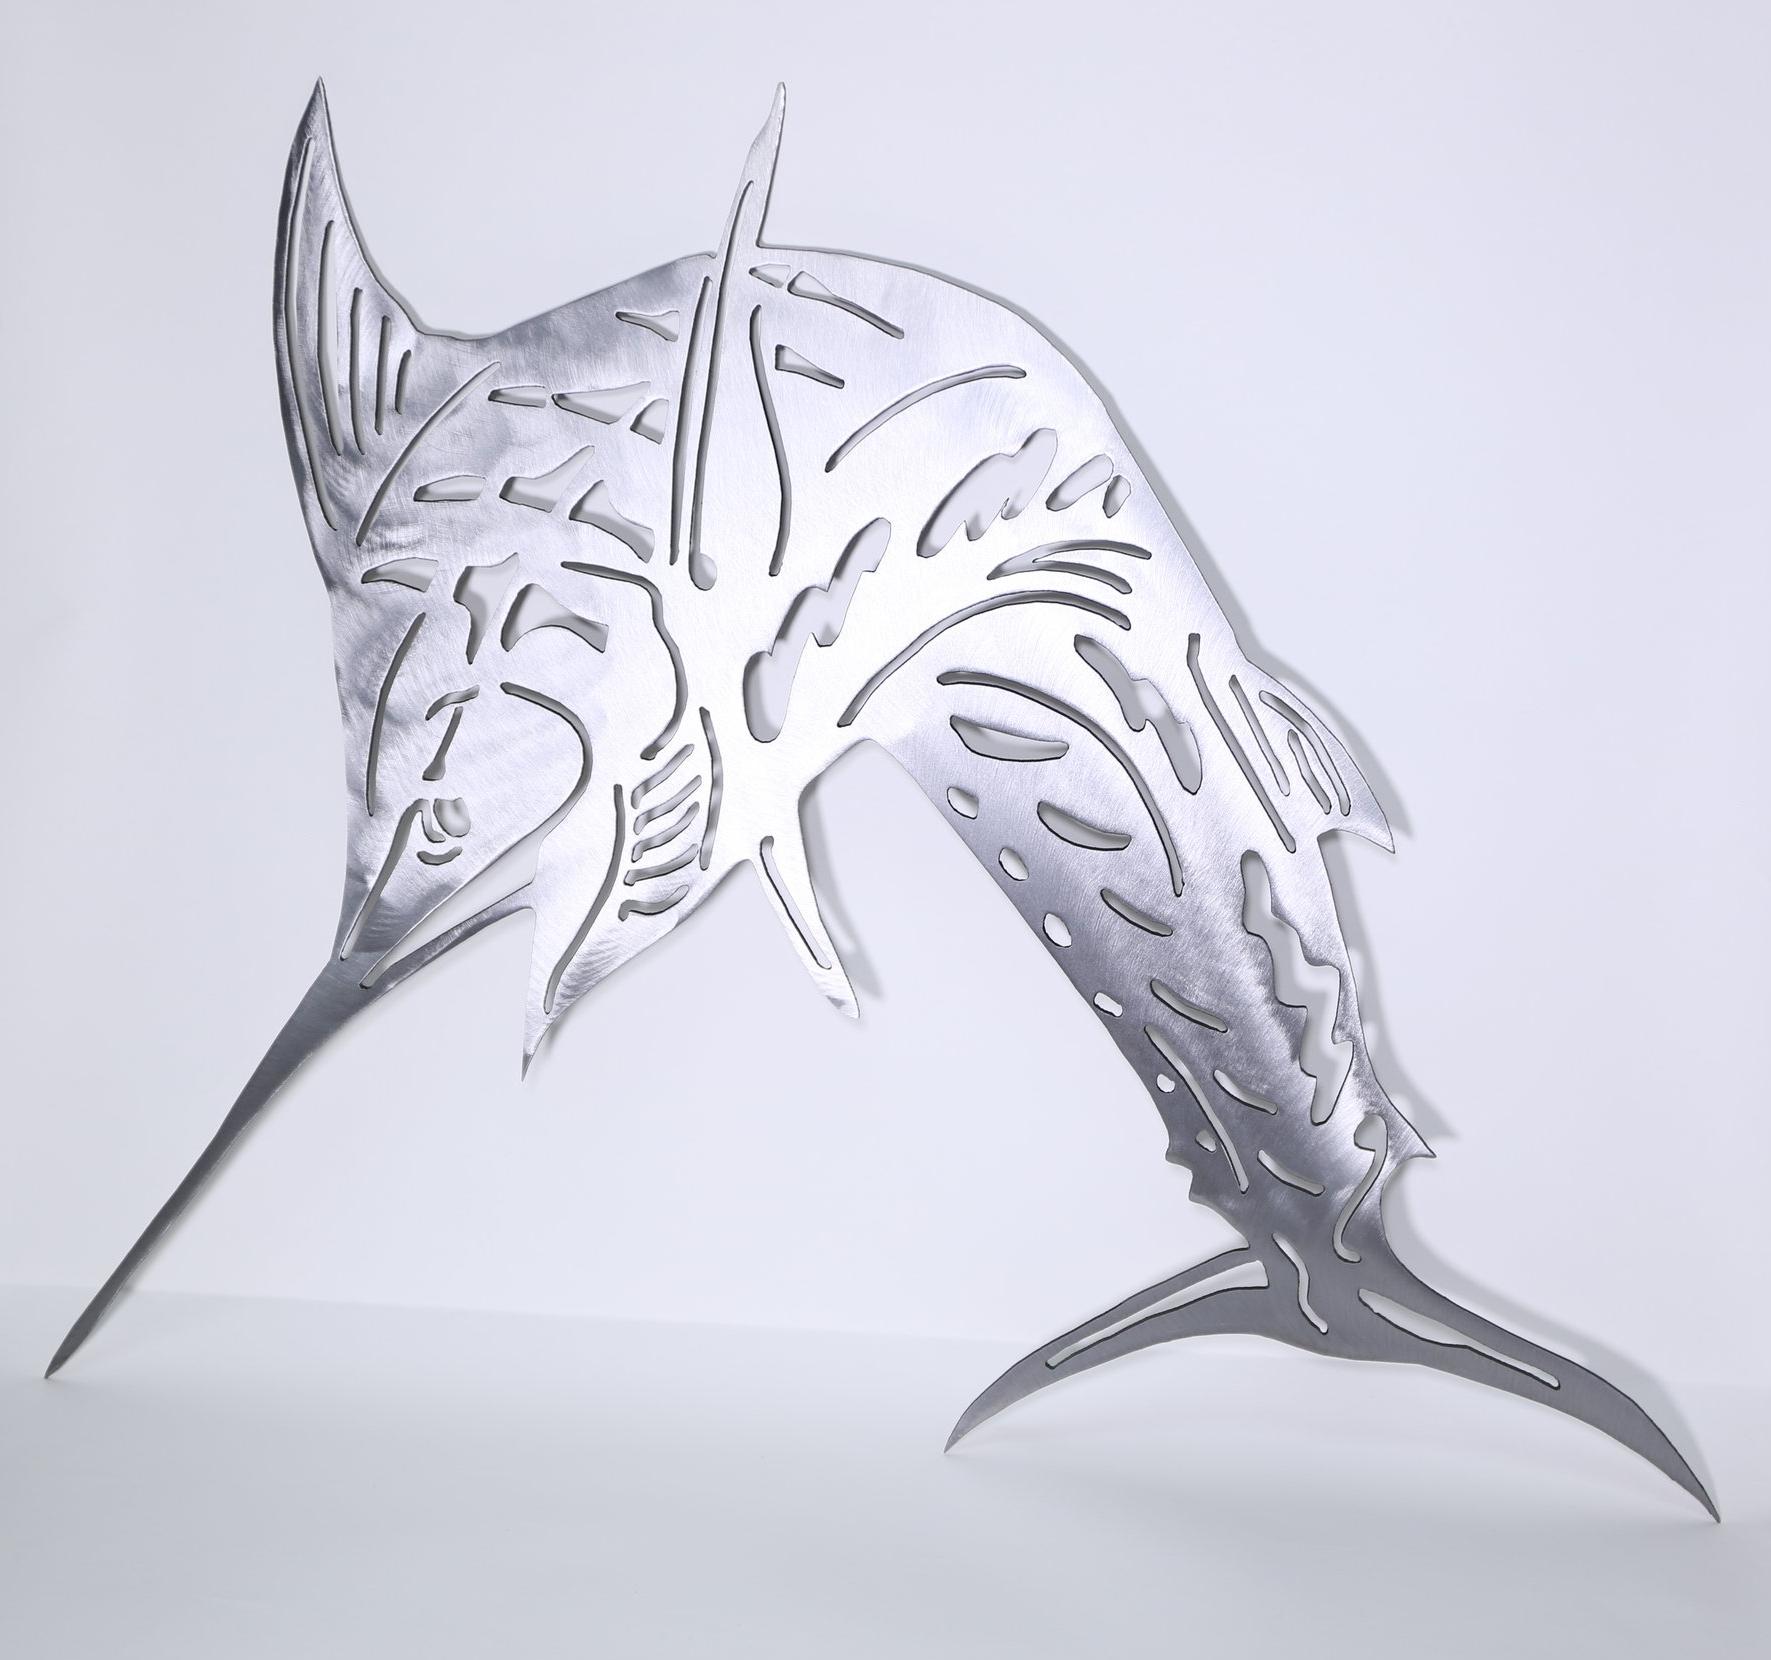 Marlin Original Metal Sculpture